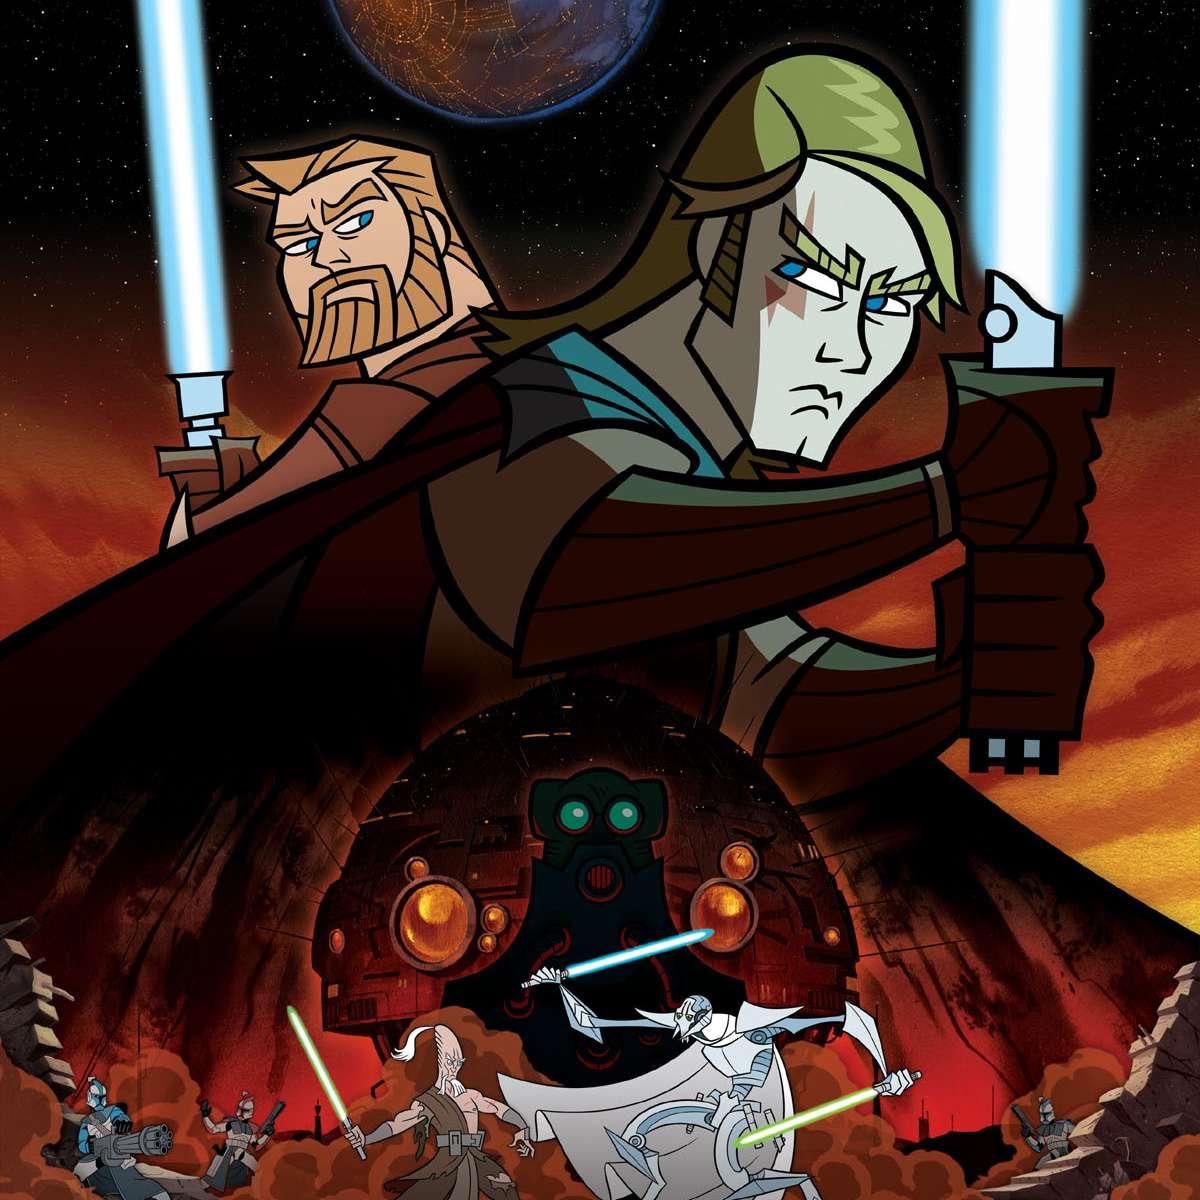 'Clone Wars' Obi-Wan Kenobi and Anakin Skywalker